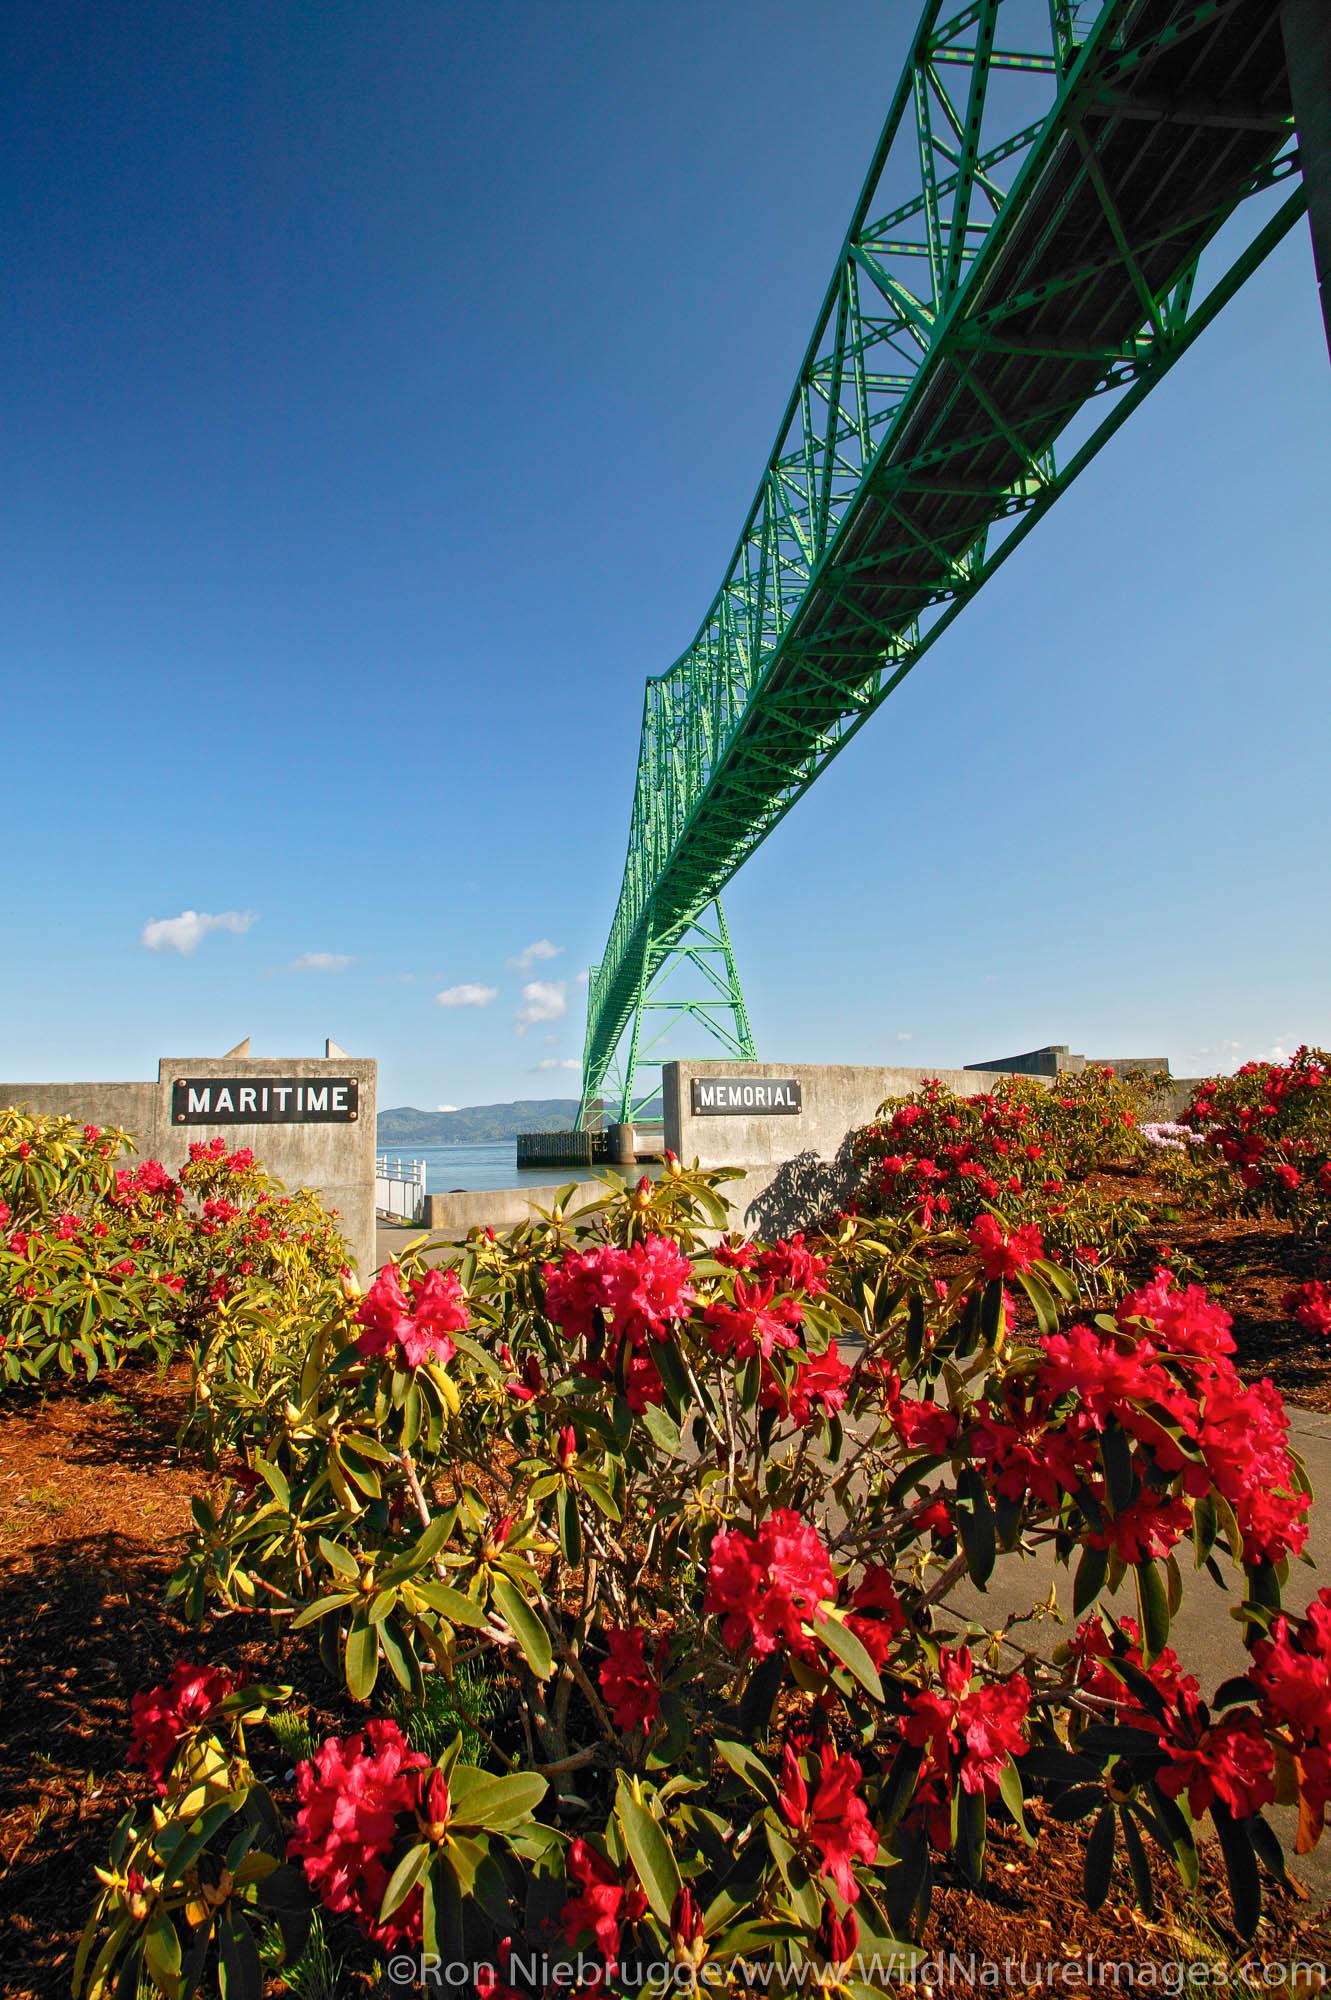 Astoria Bridge over the Columbia River from the Maritime Memorial, Astoria, Washington.